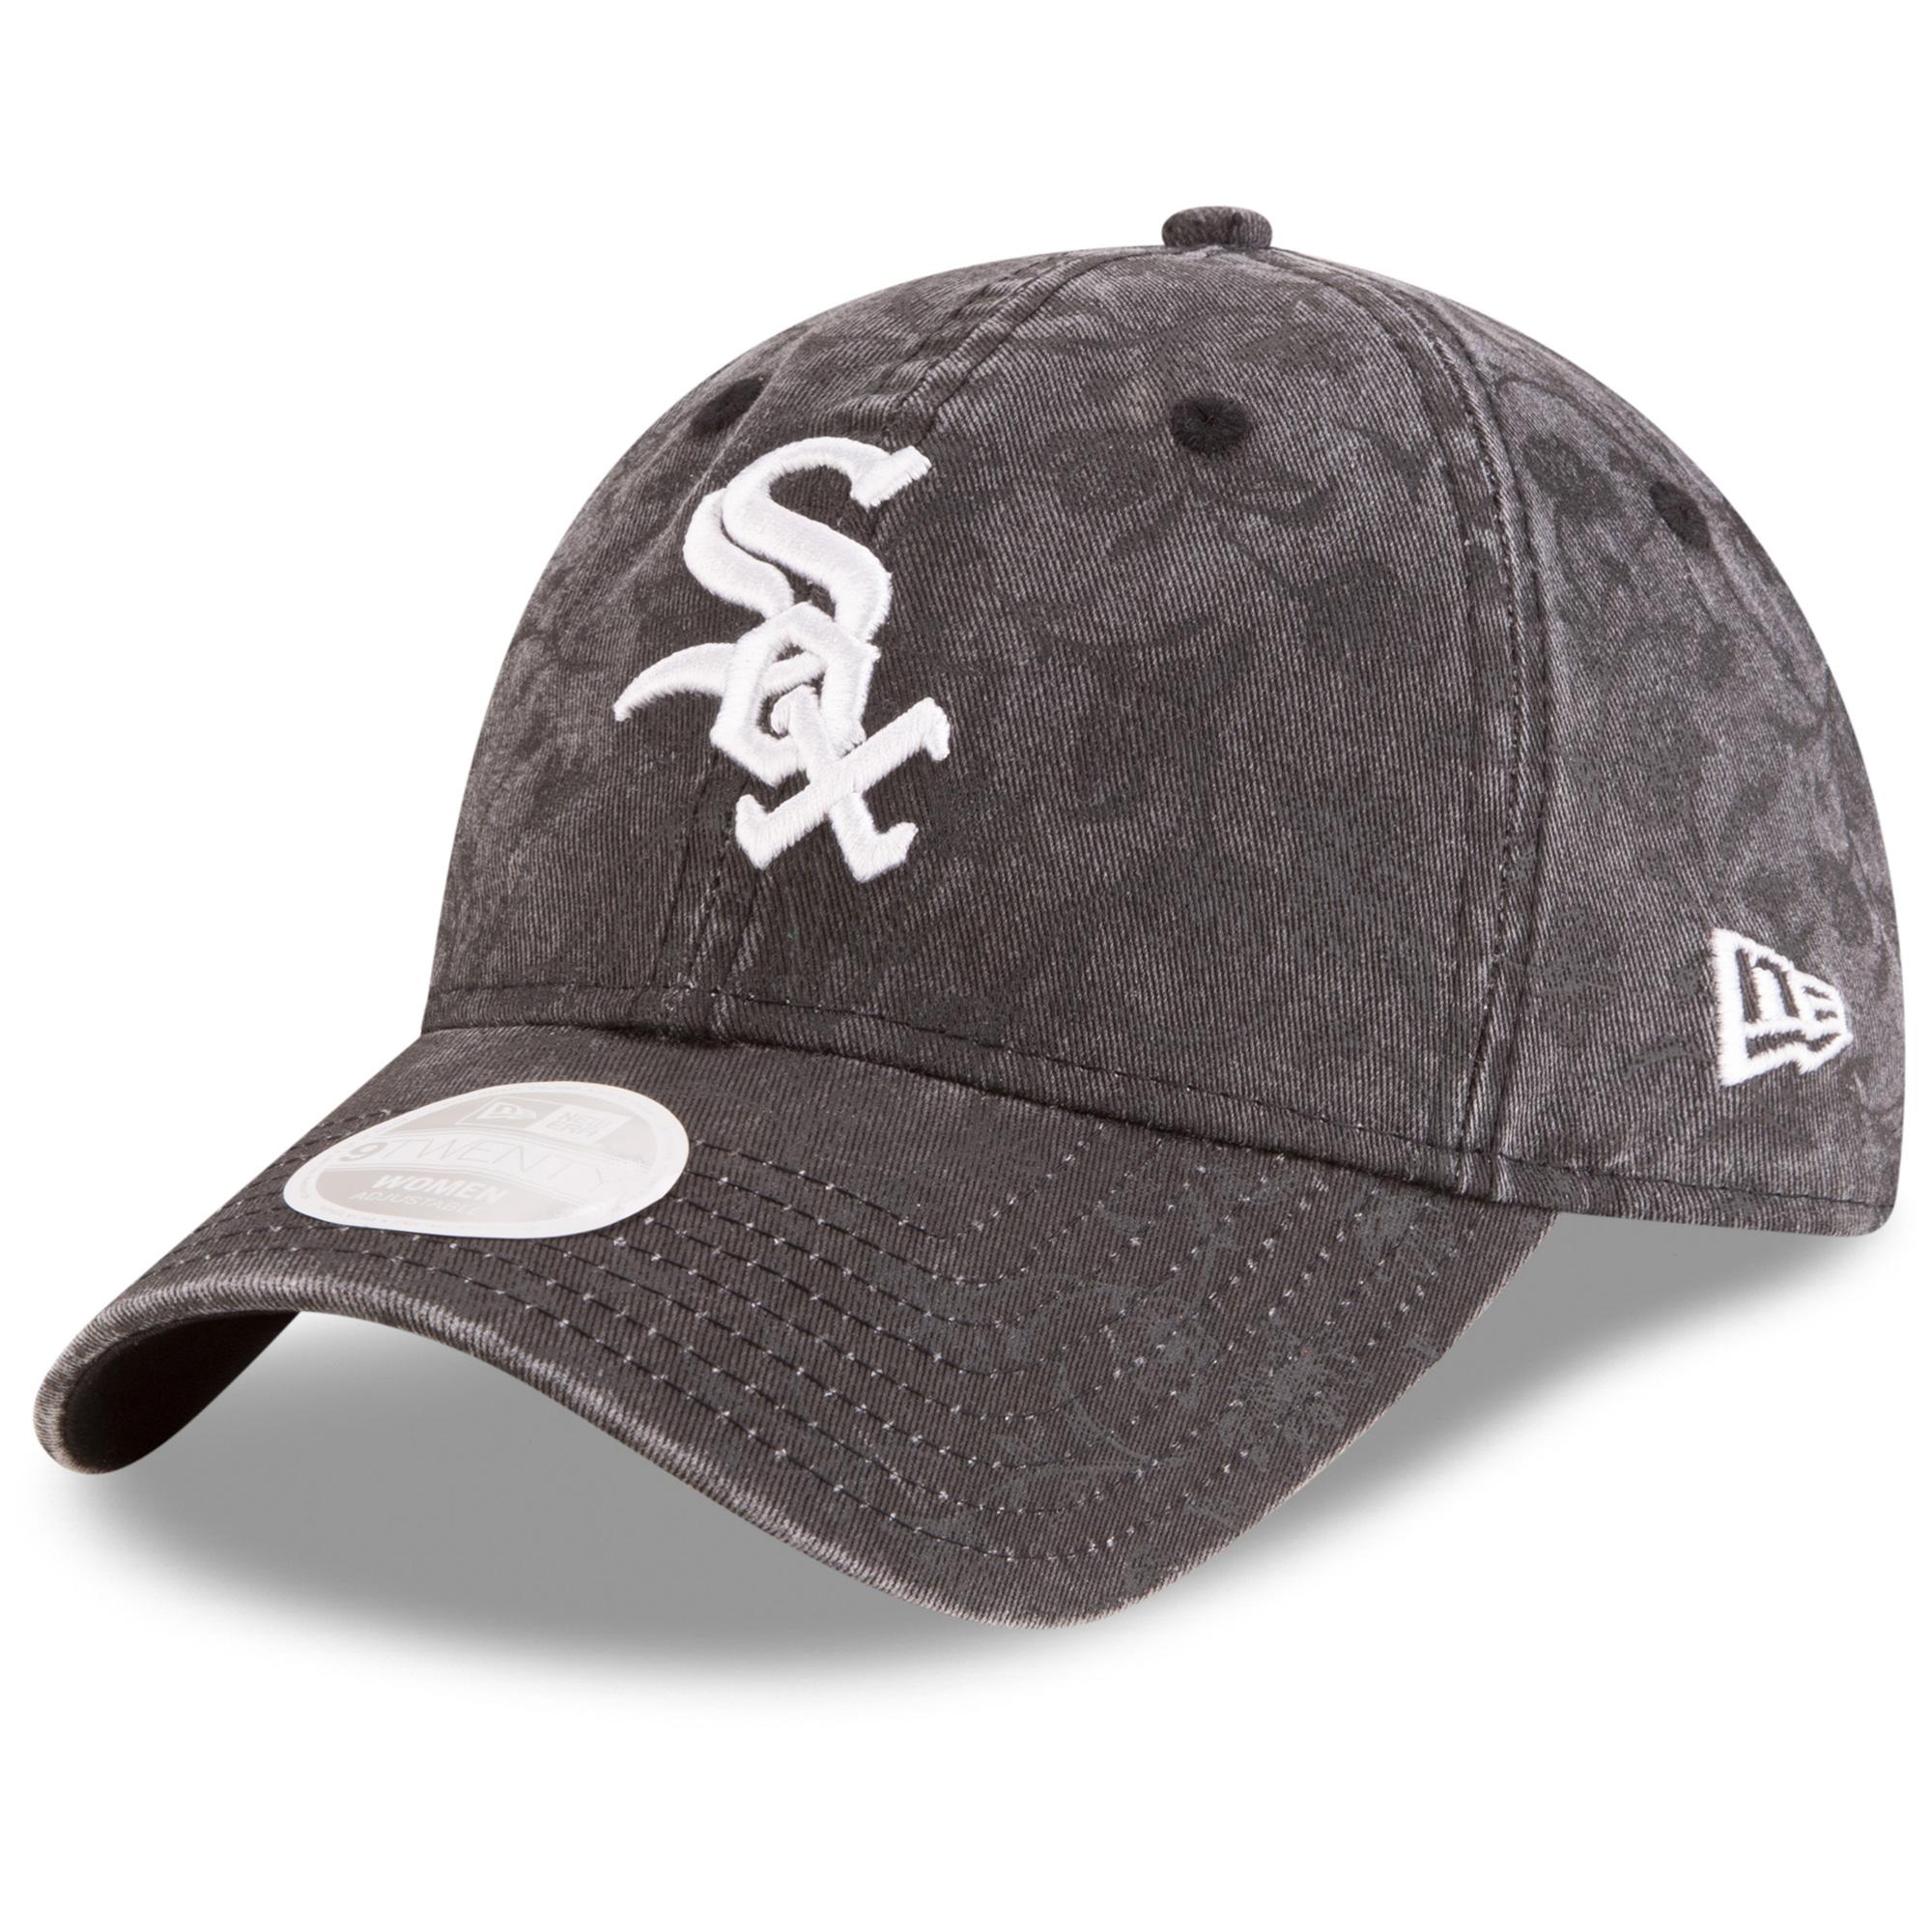 Chicago White Sox New Era Girls Youth Floral Peek 9TWENTY Adjustable Hat - Black - OSFA